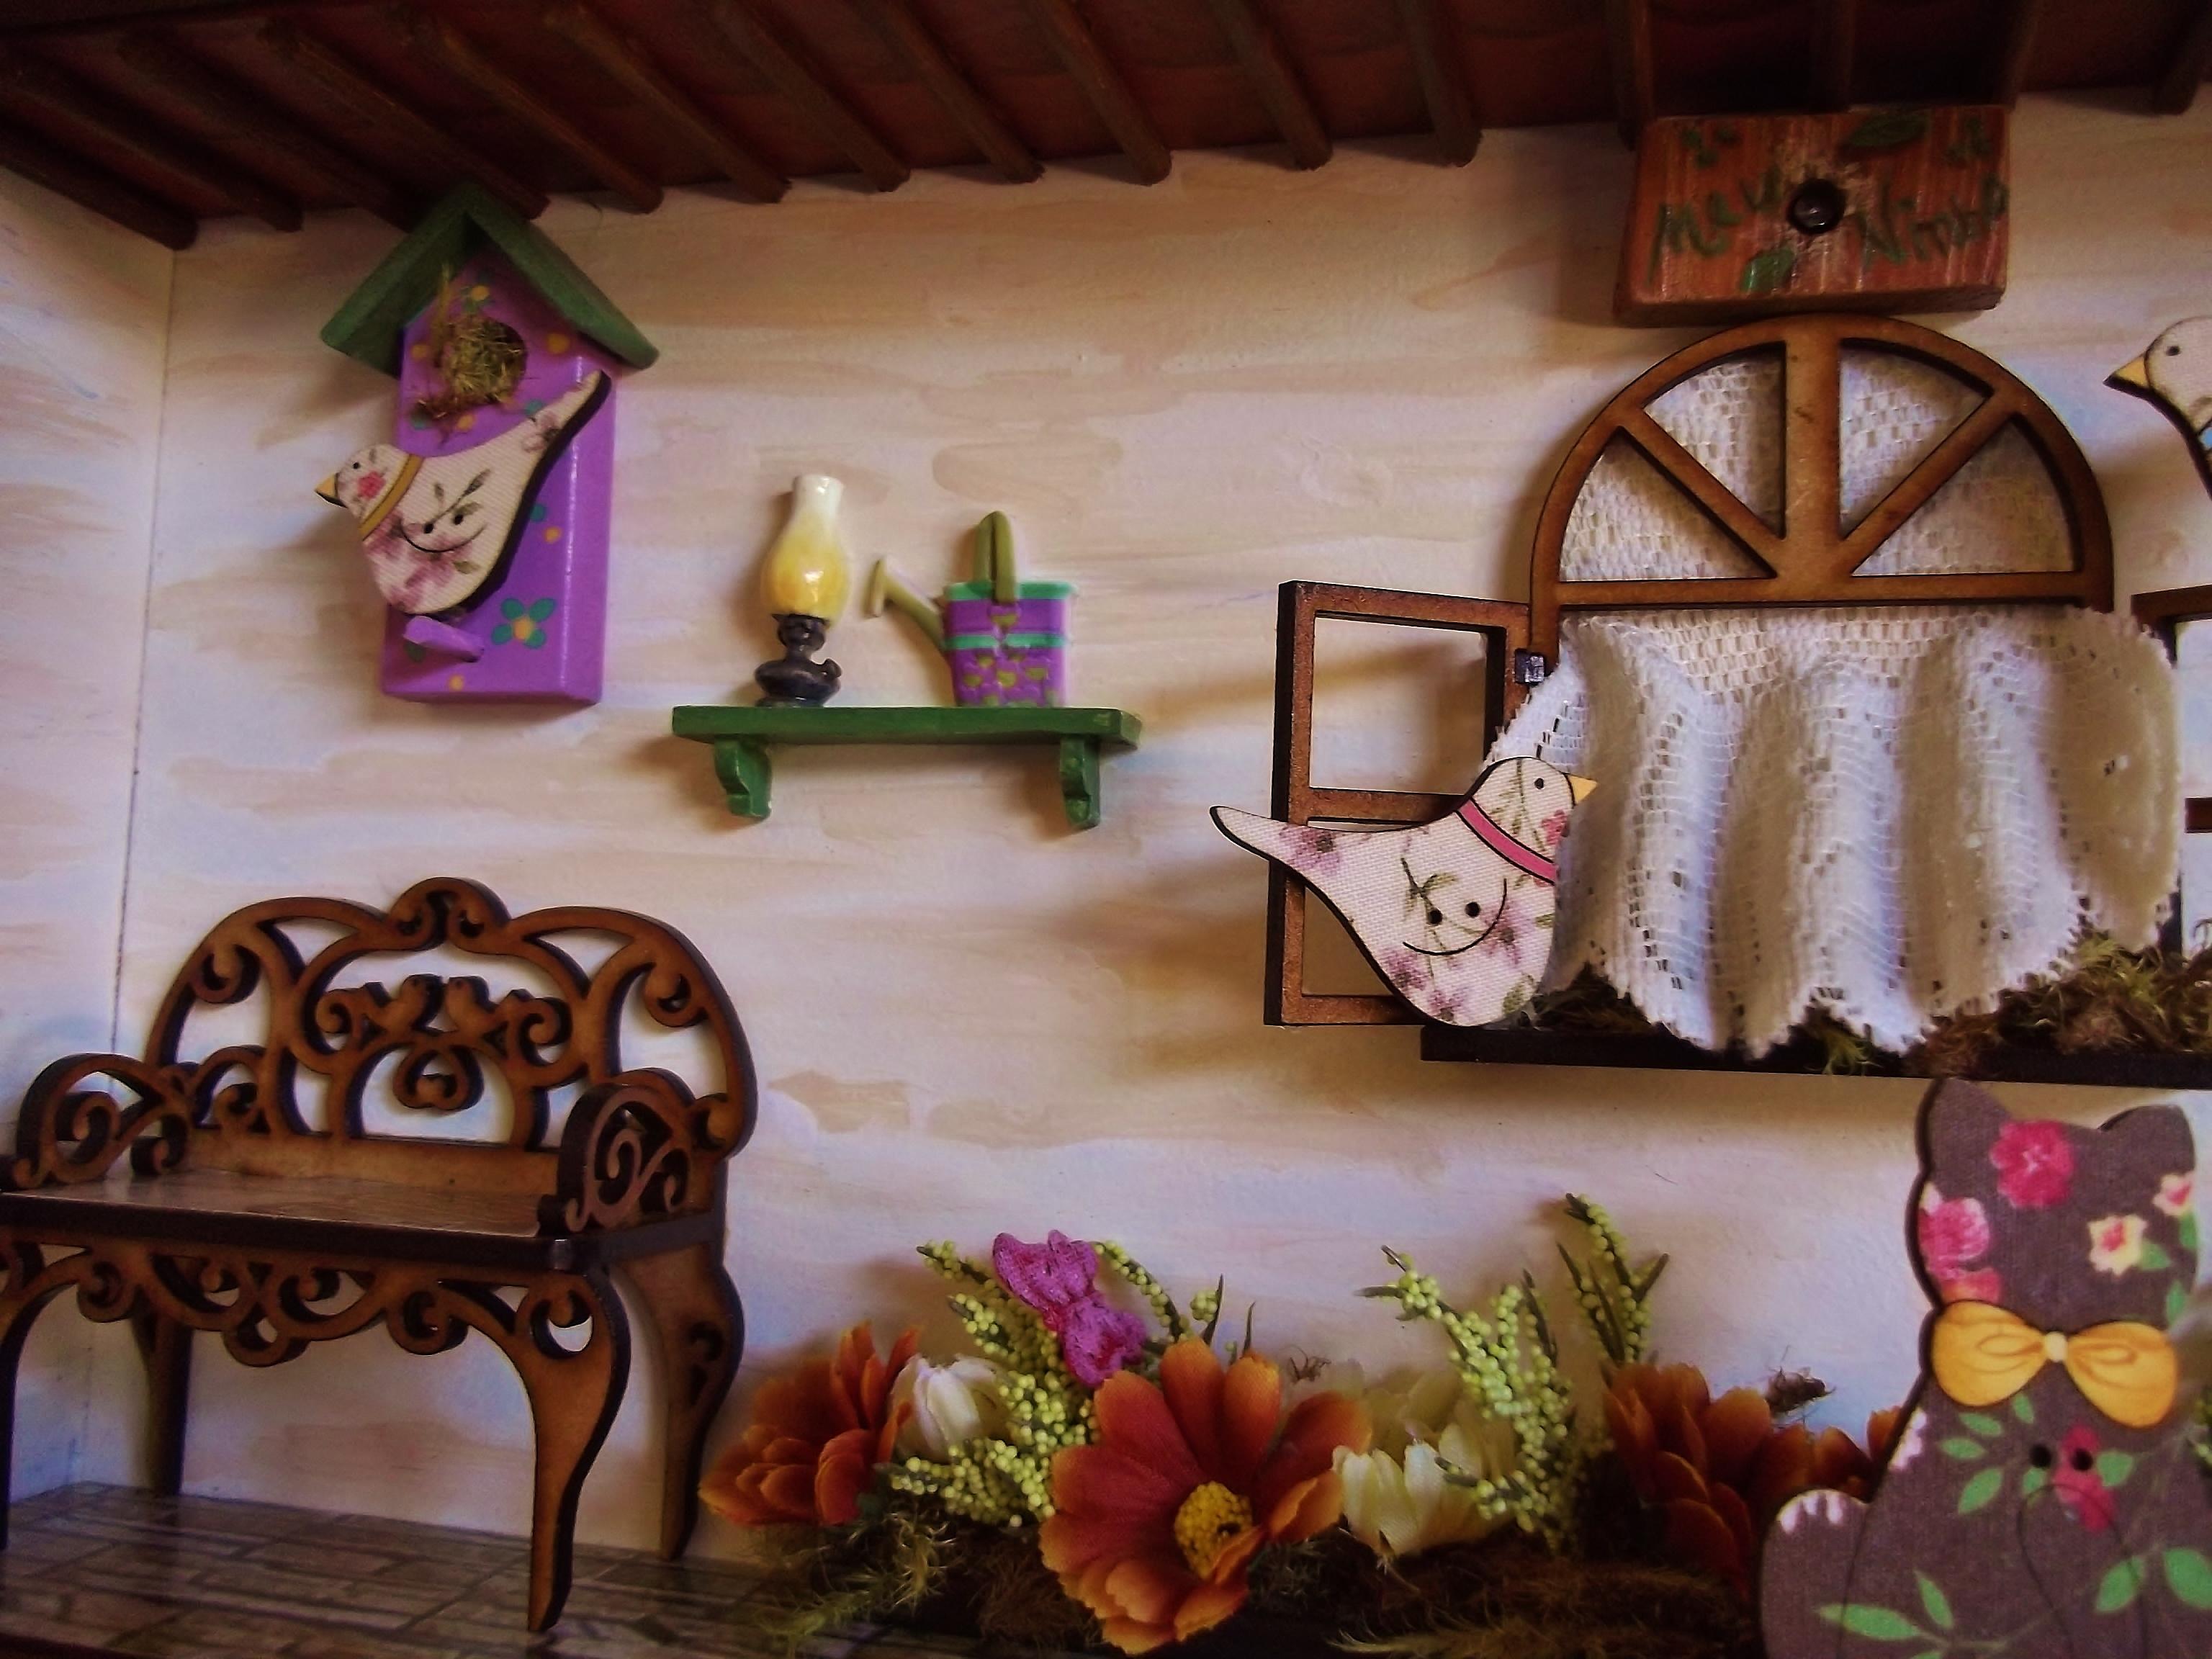 ideias jardim varanda: varanda-jardim-quadro-cenario quadro-cenario-varanda-jardim-decoracao